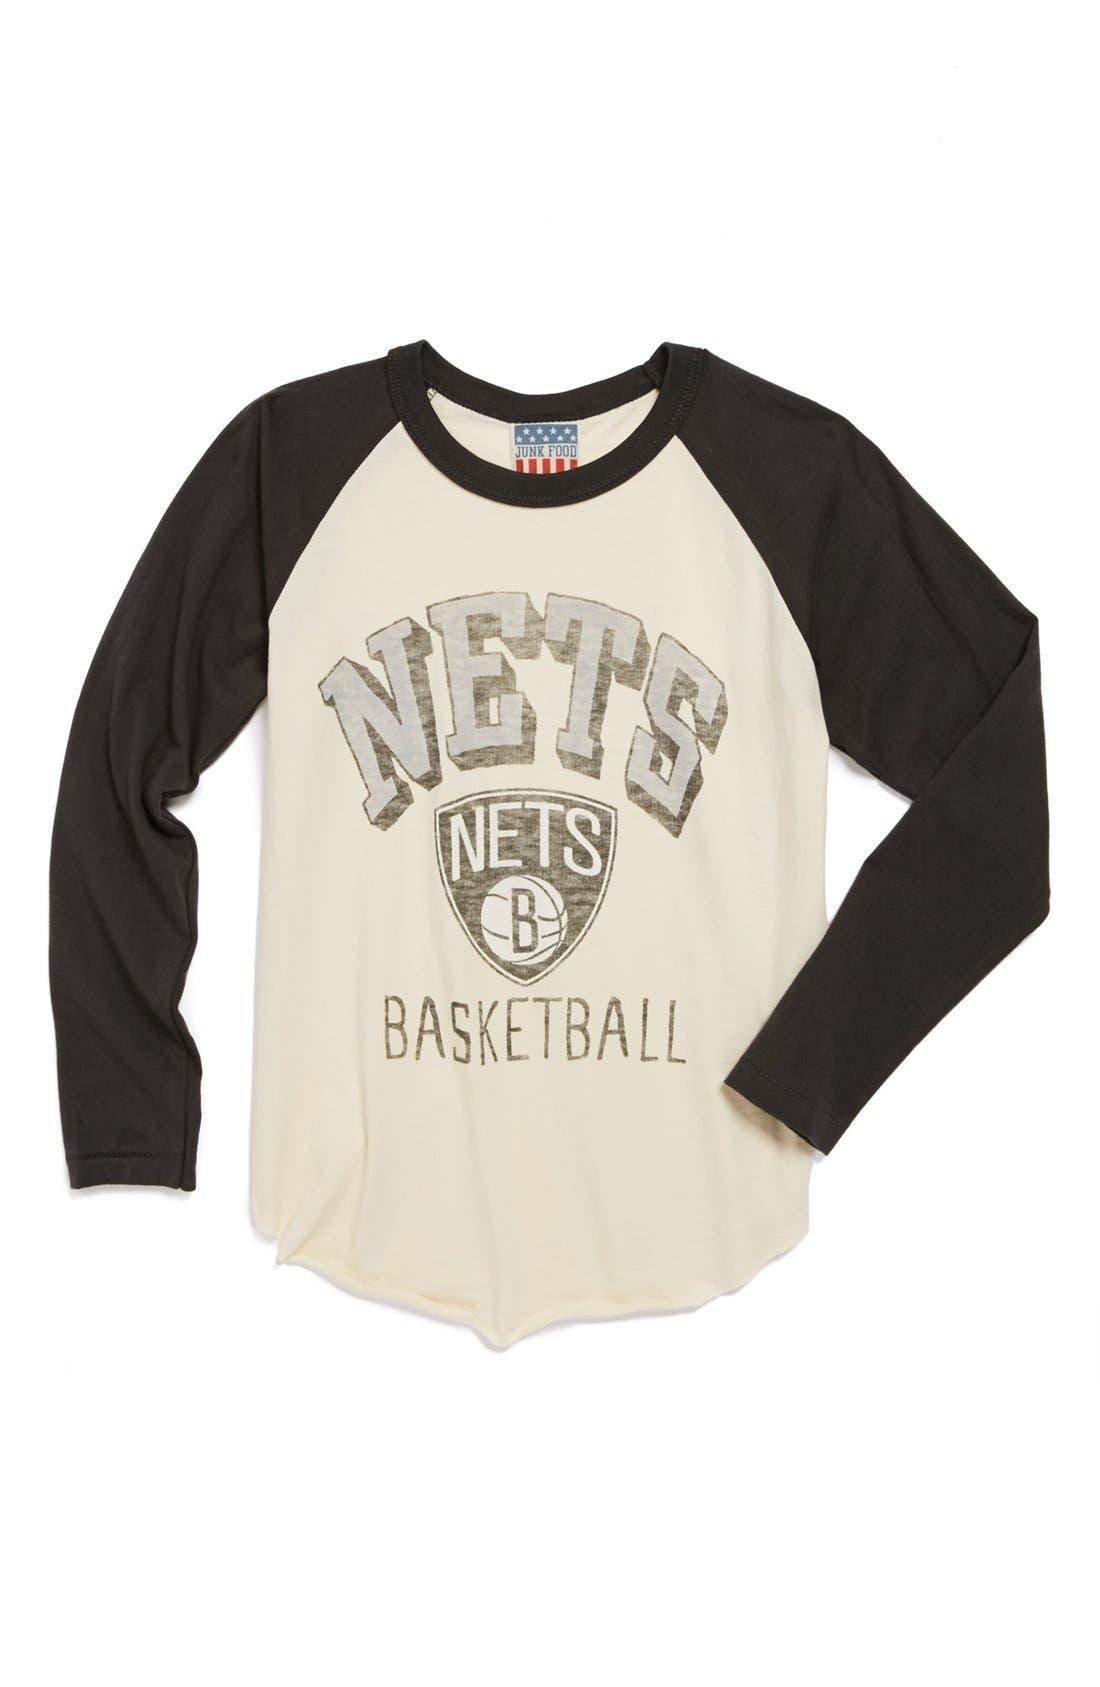 Alternate Image 1 Selected - Junk Food 'Brooklyn Nets' Raglan Shirt (Little Boys & Big Boys)